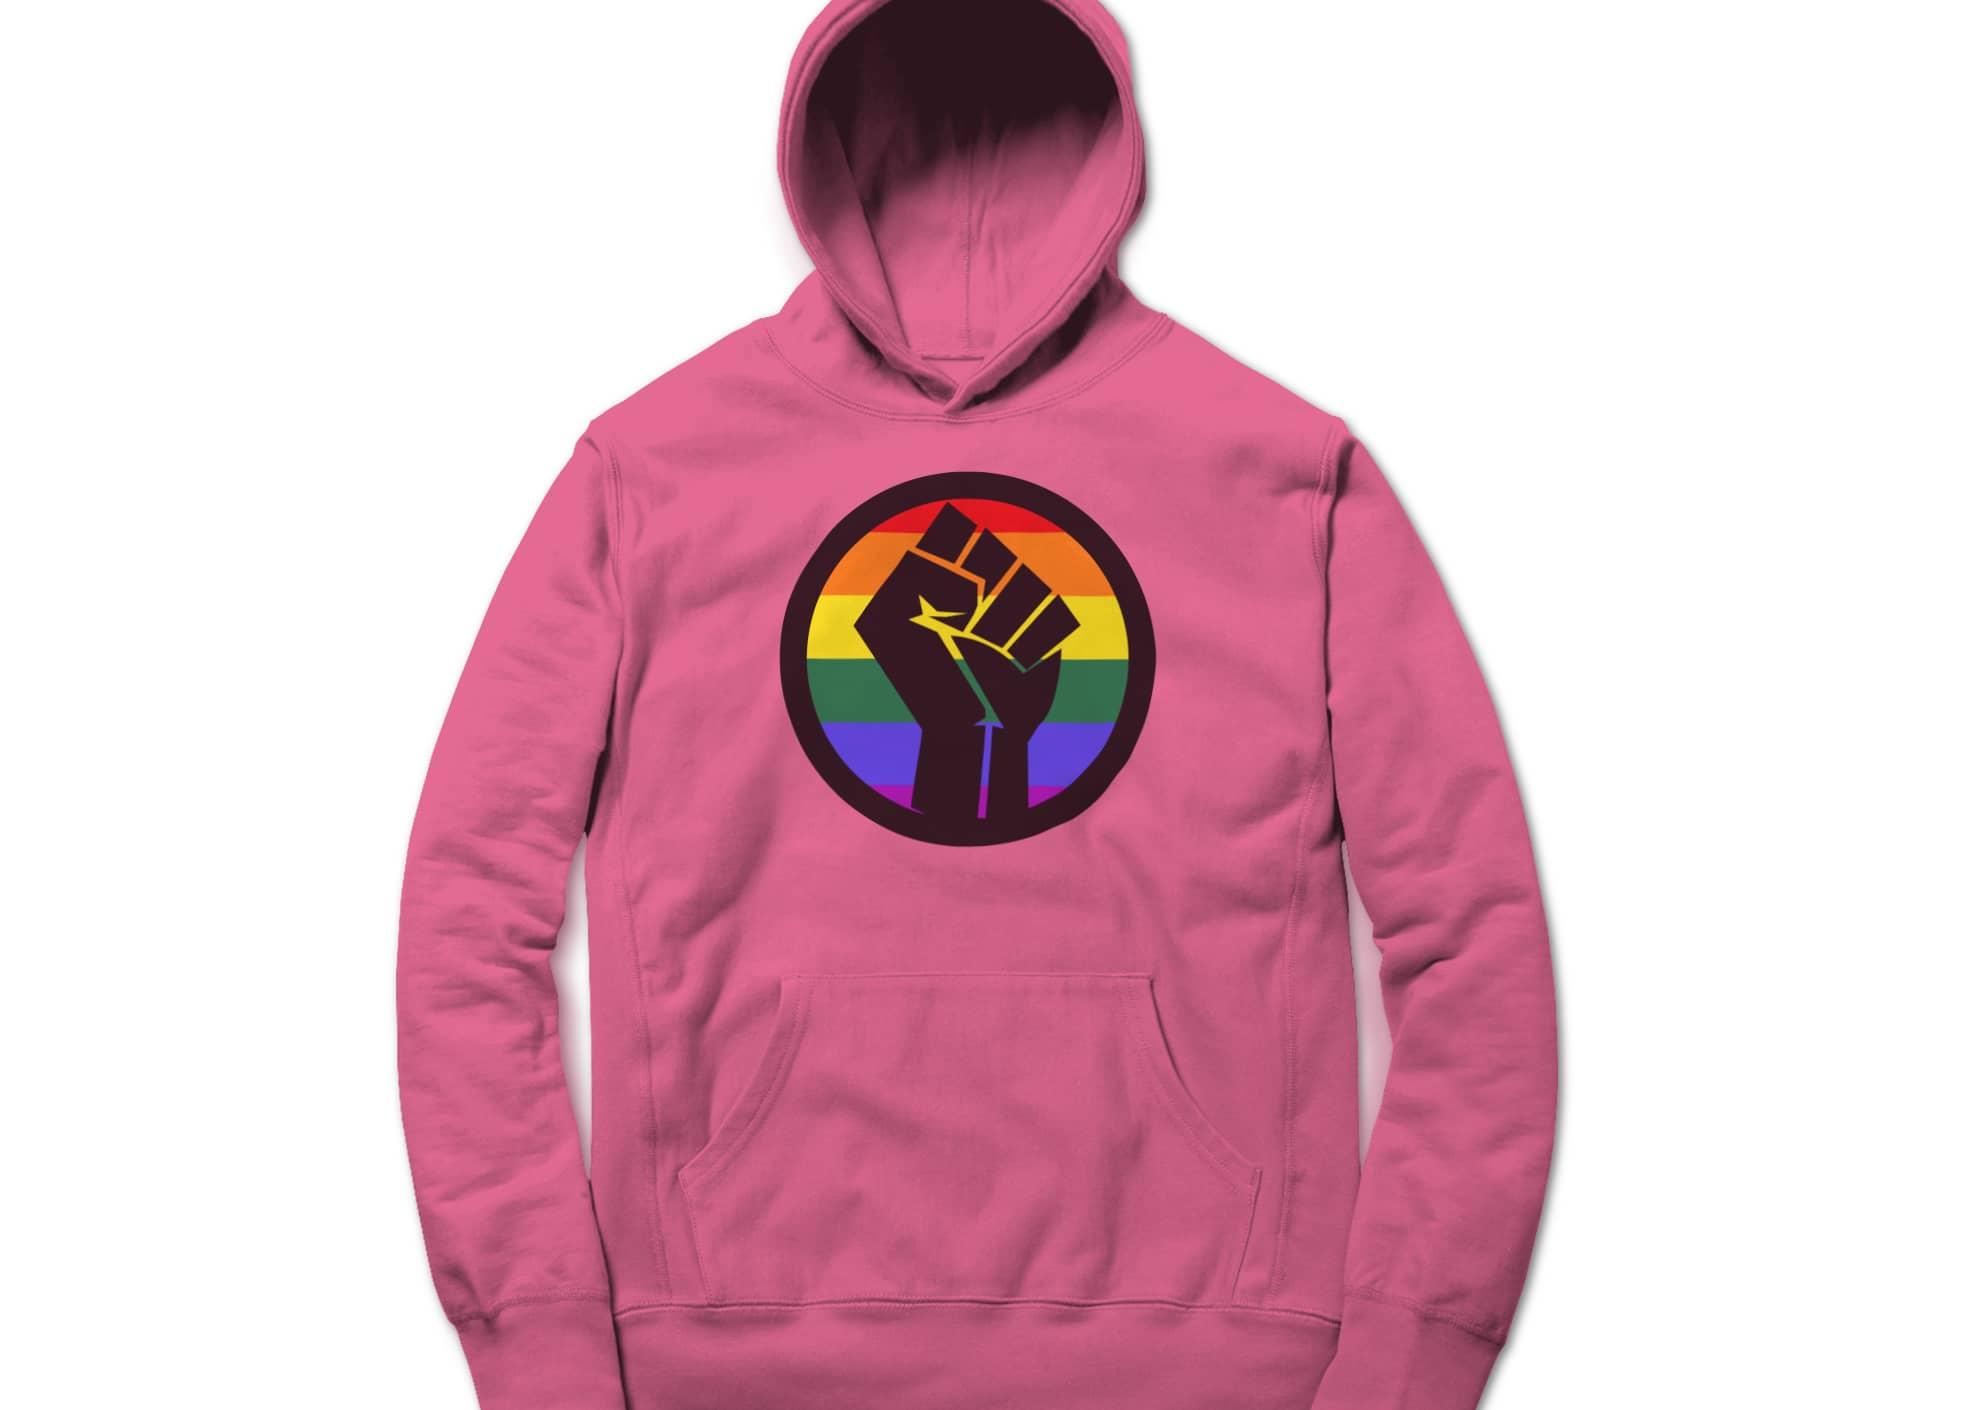 Give rainbow power 1593355904